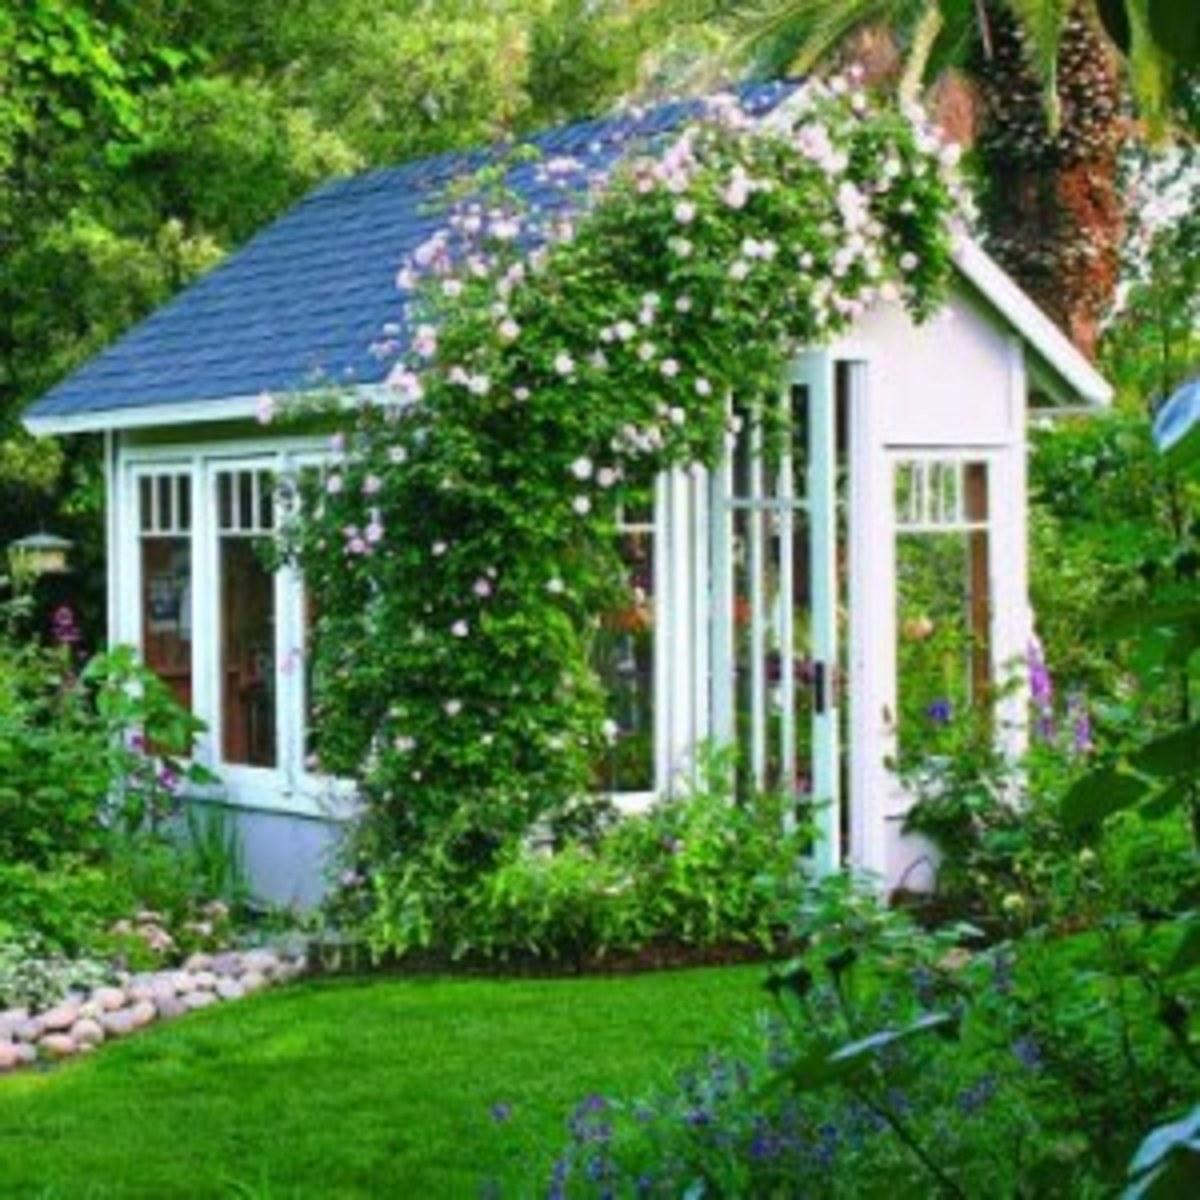 Beautiful Garden Shed with glass windows doors and climbing rose